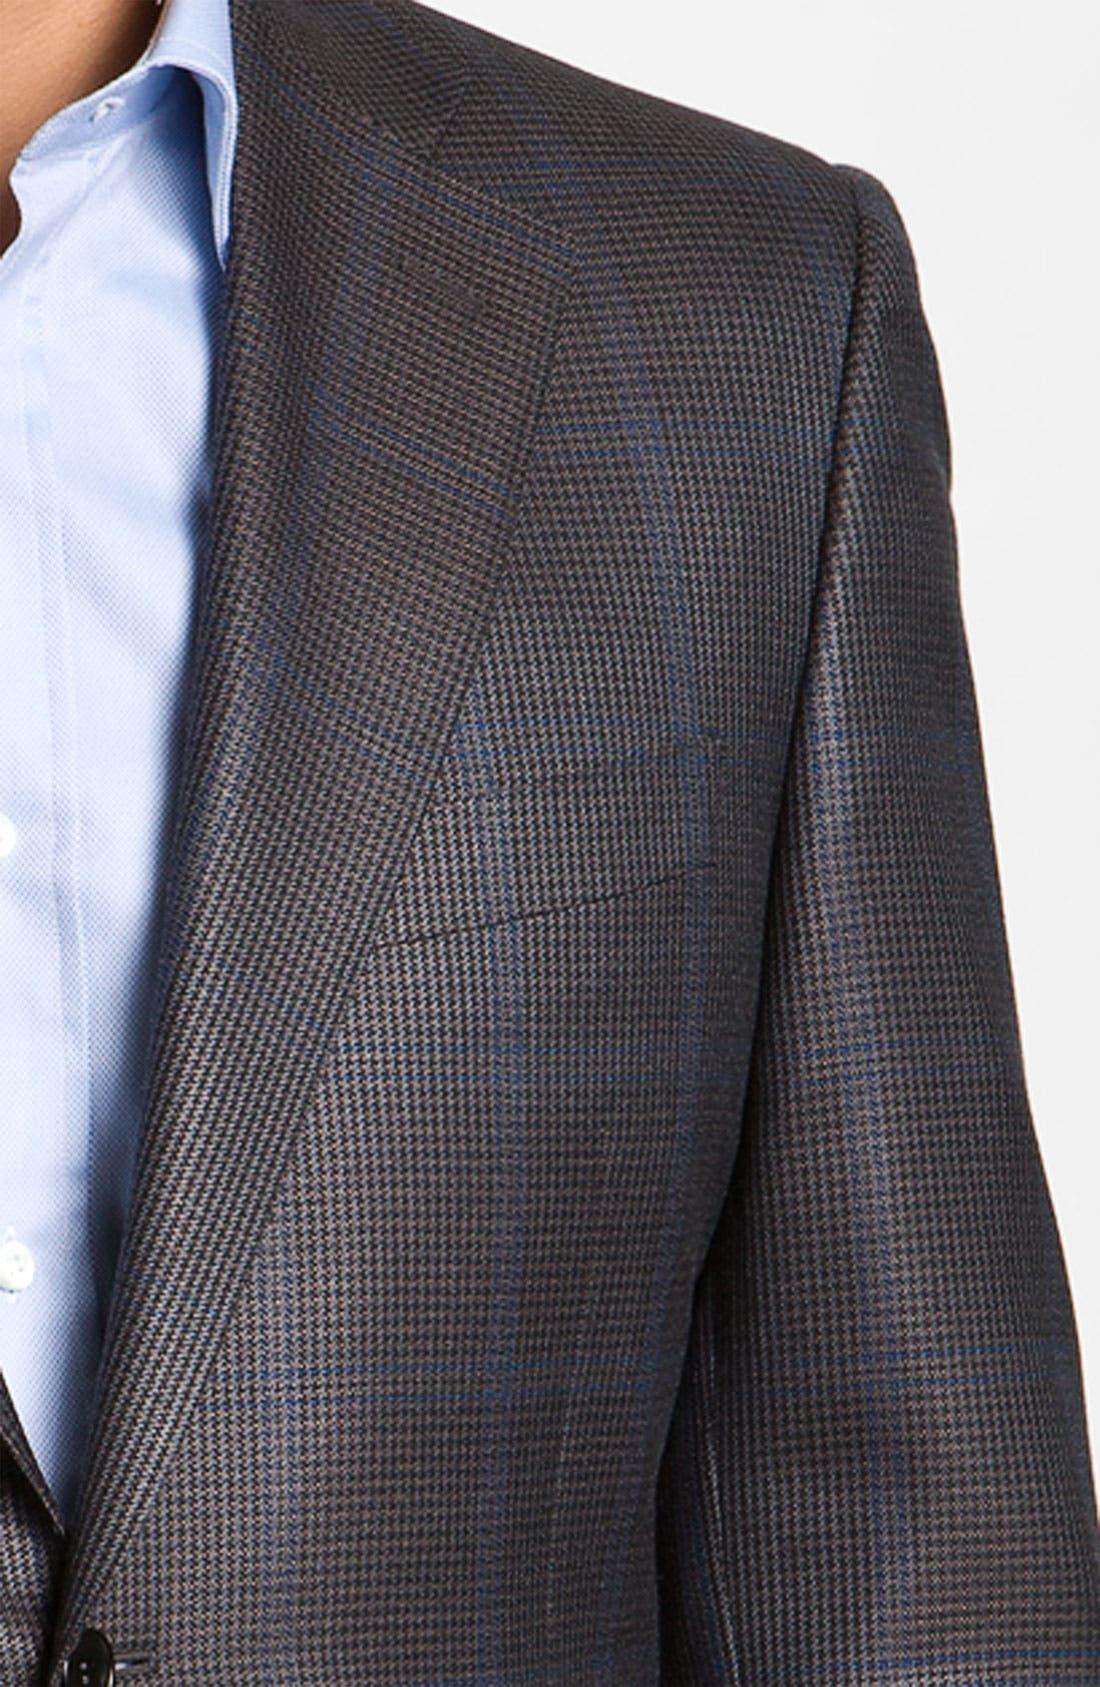 Alternate Image 3  - Canali Silk Blend Sportcoat